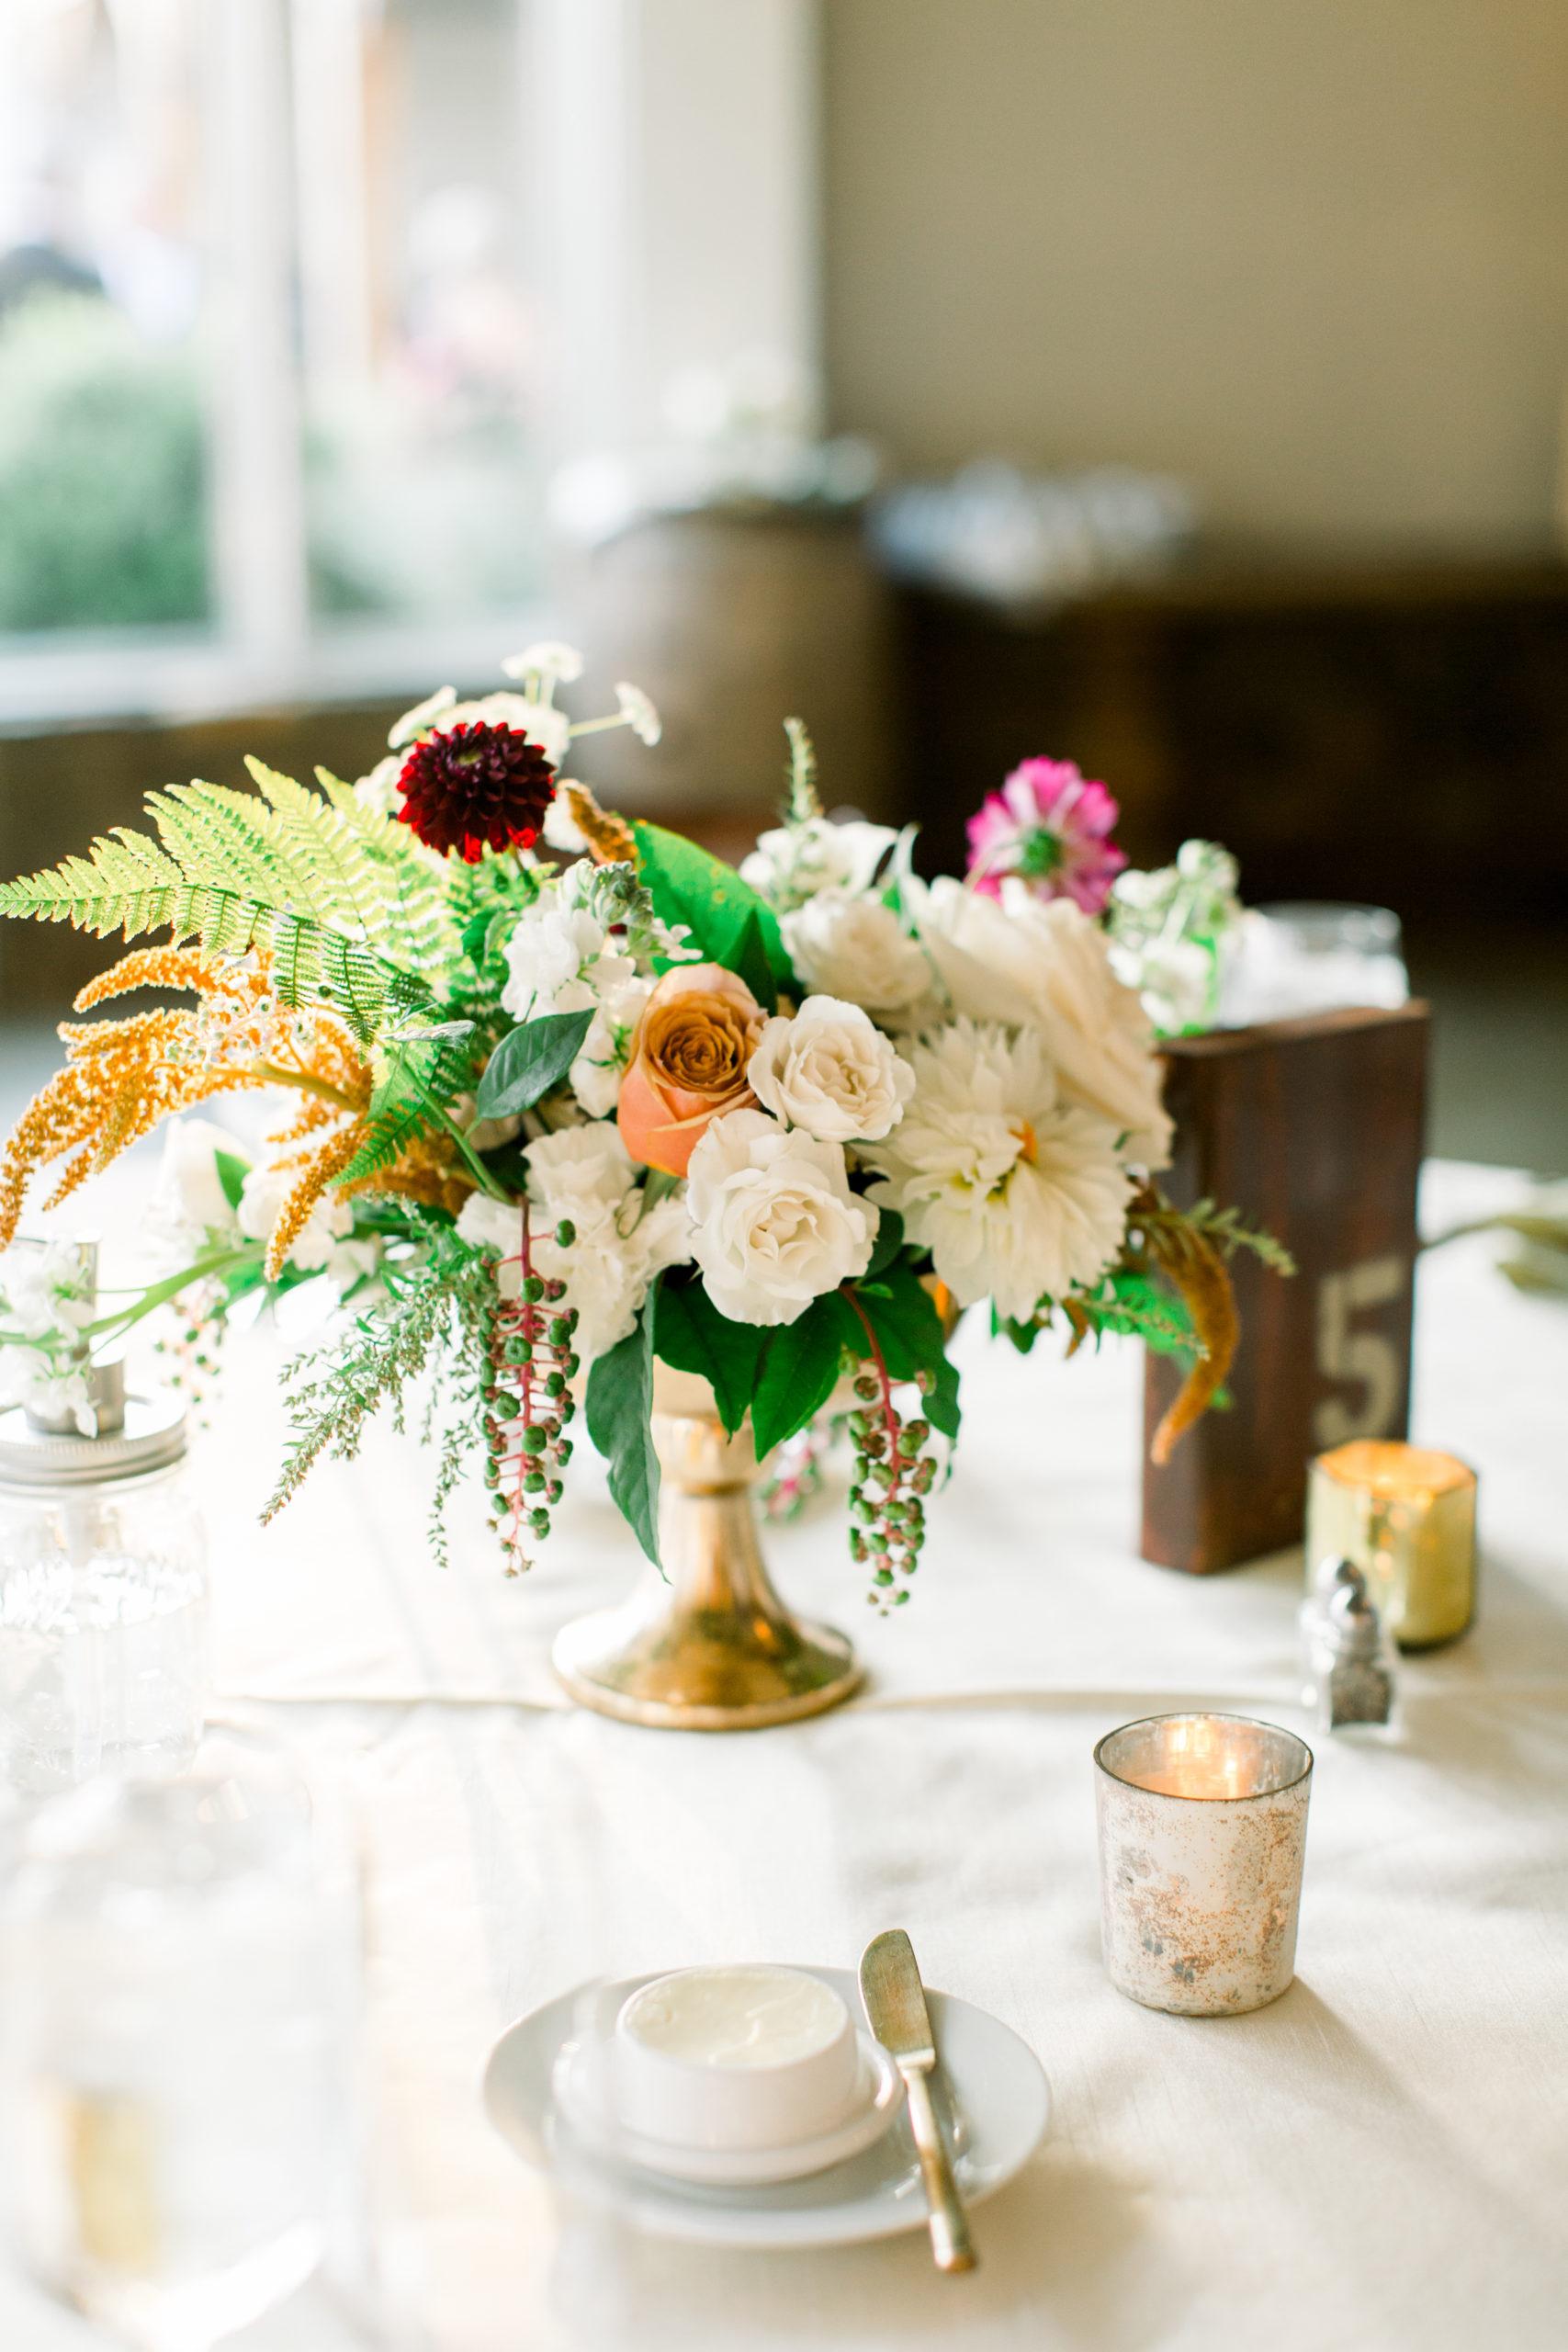 stone tower winery, virginia florist, dc florist, classic wedding,